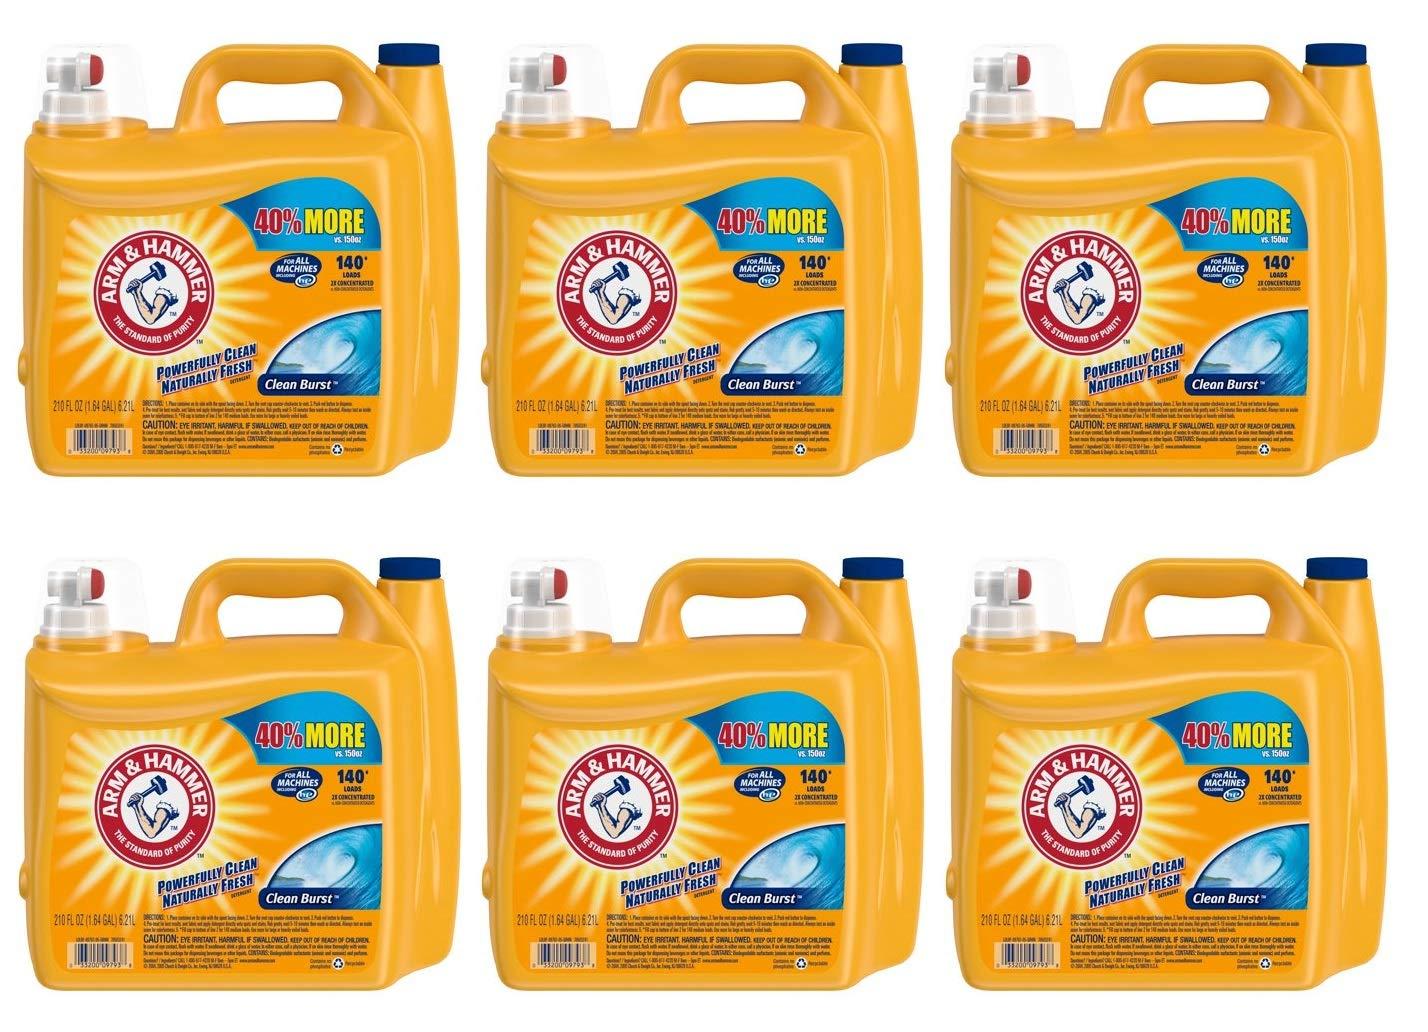 Arm & Hammer 2X Ultra Clean Burst Liquid Laundry Detergent 210 oz WLM (Pack of 6)